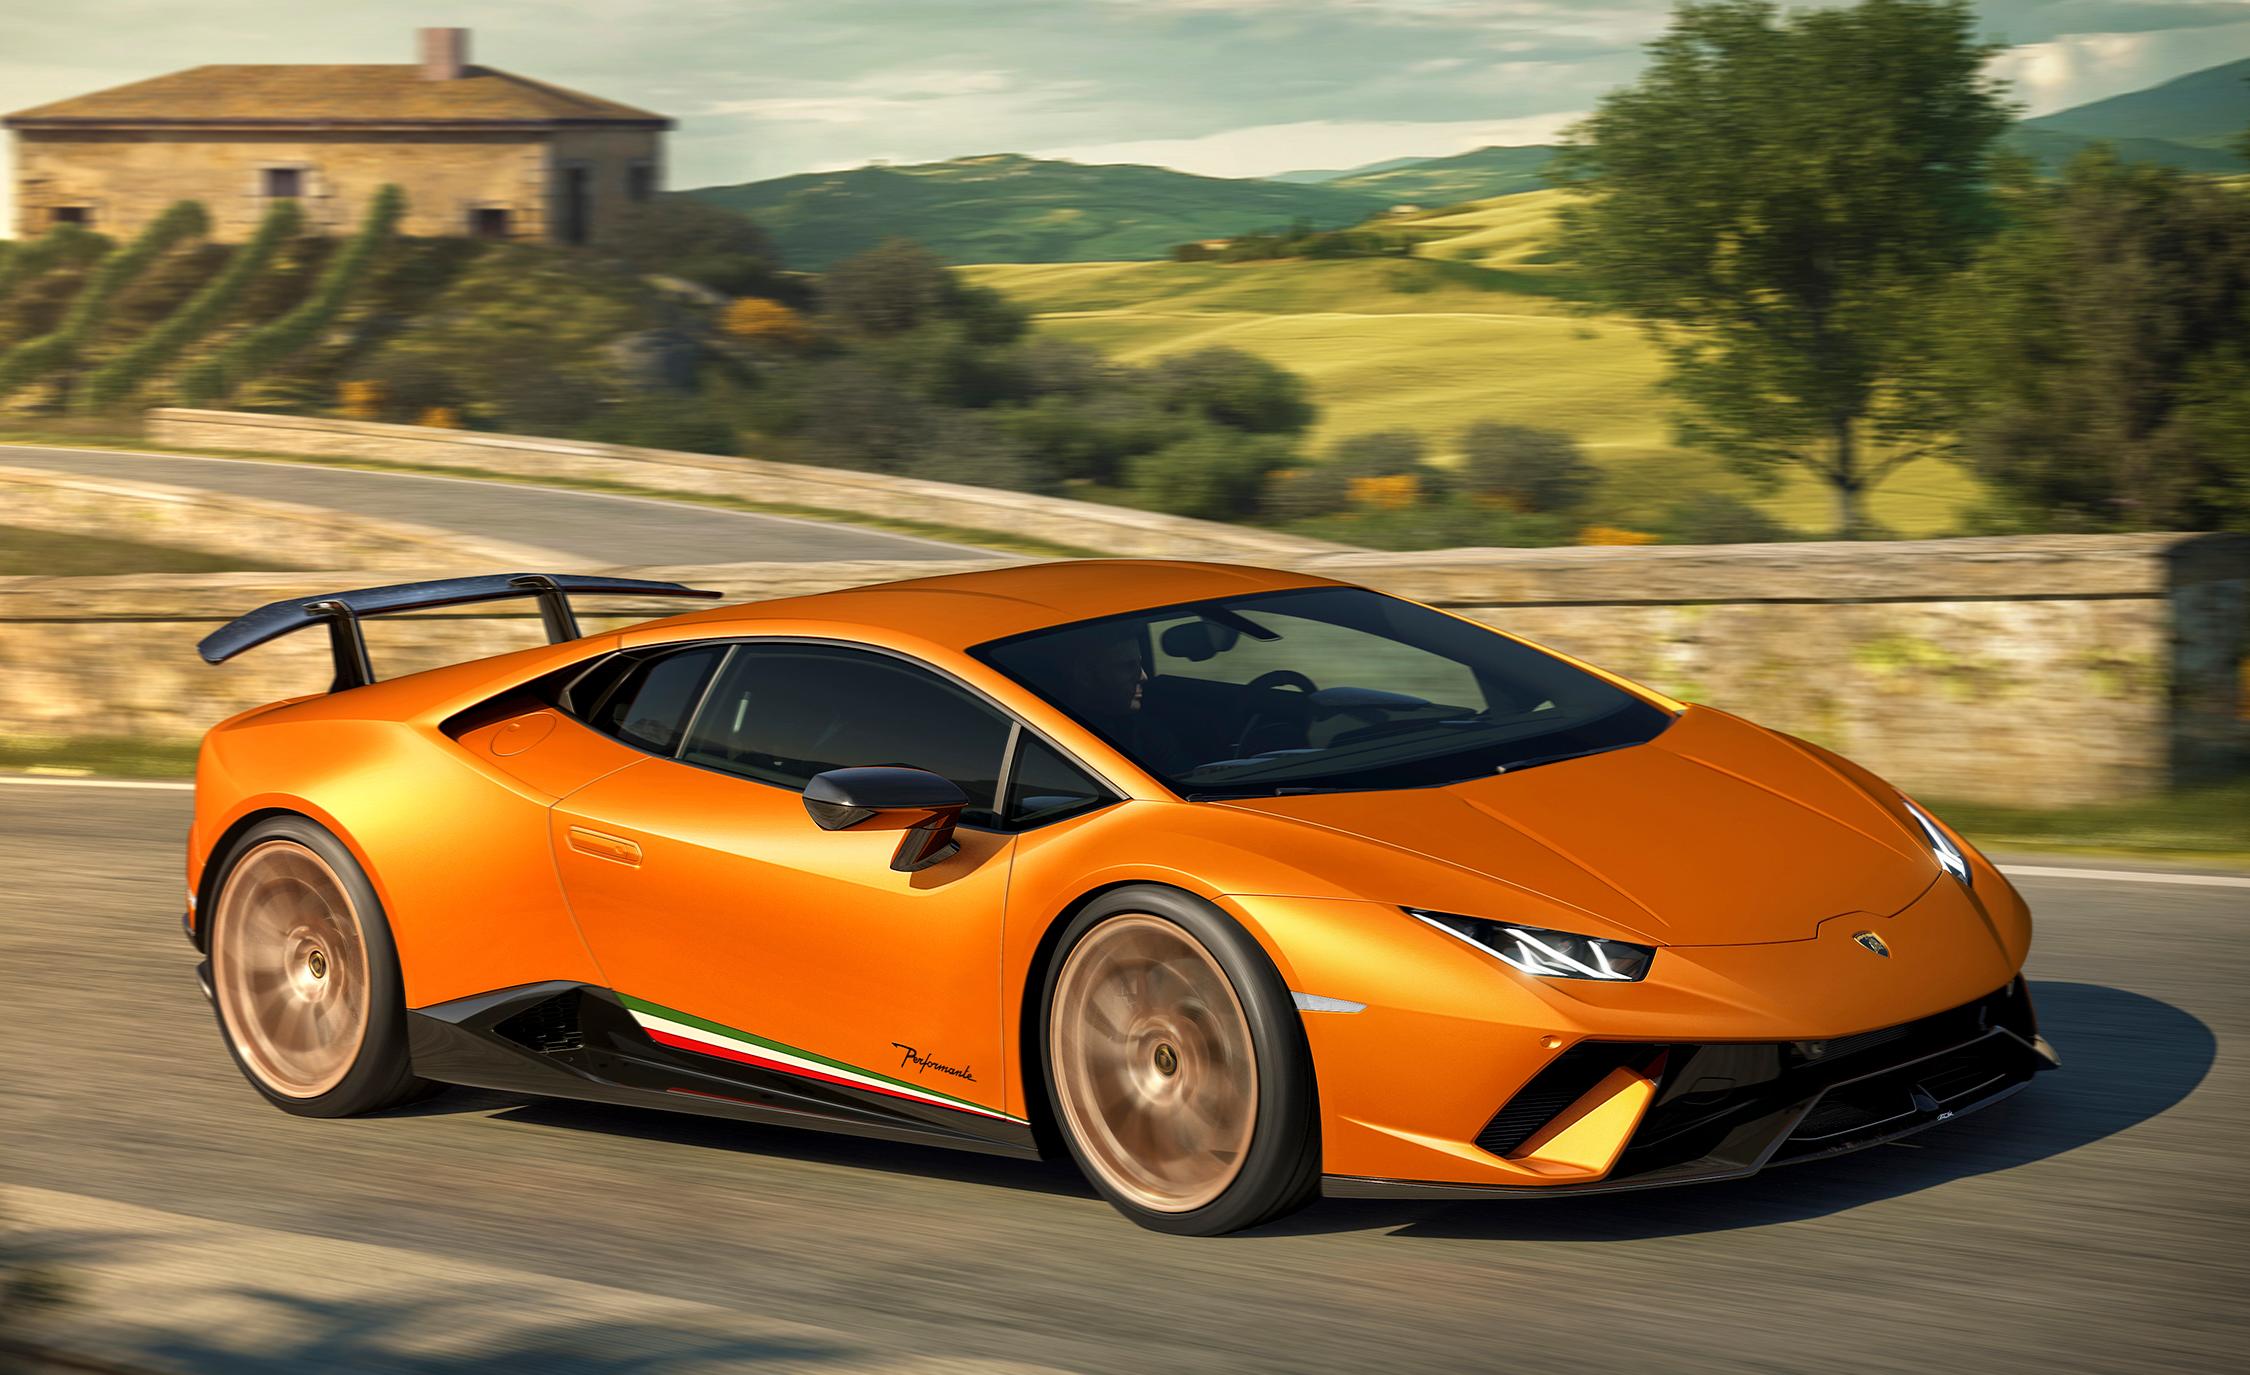 Lamborghini Huracan Preço 2017 >> 2018 Lamborghini Huracan Performante Photos And Info News Car